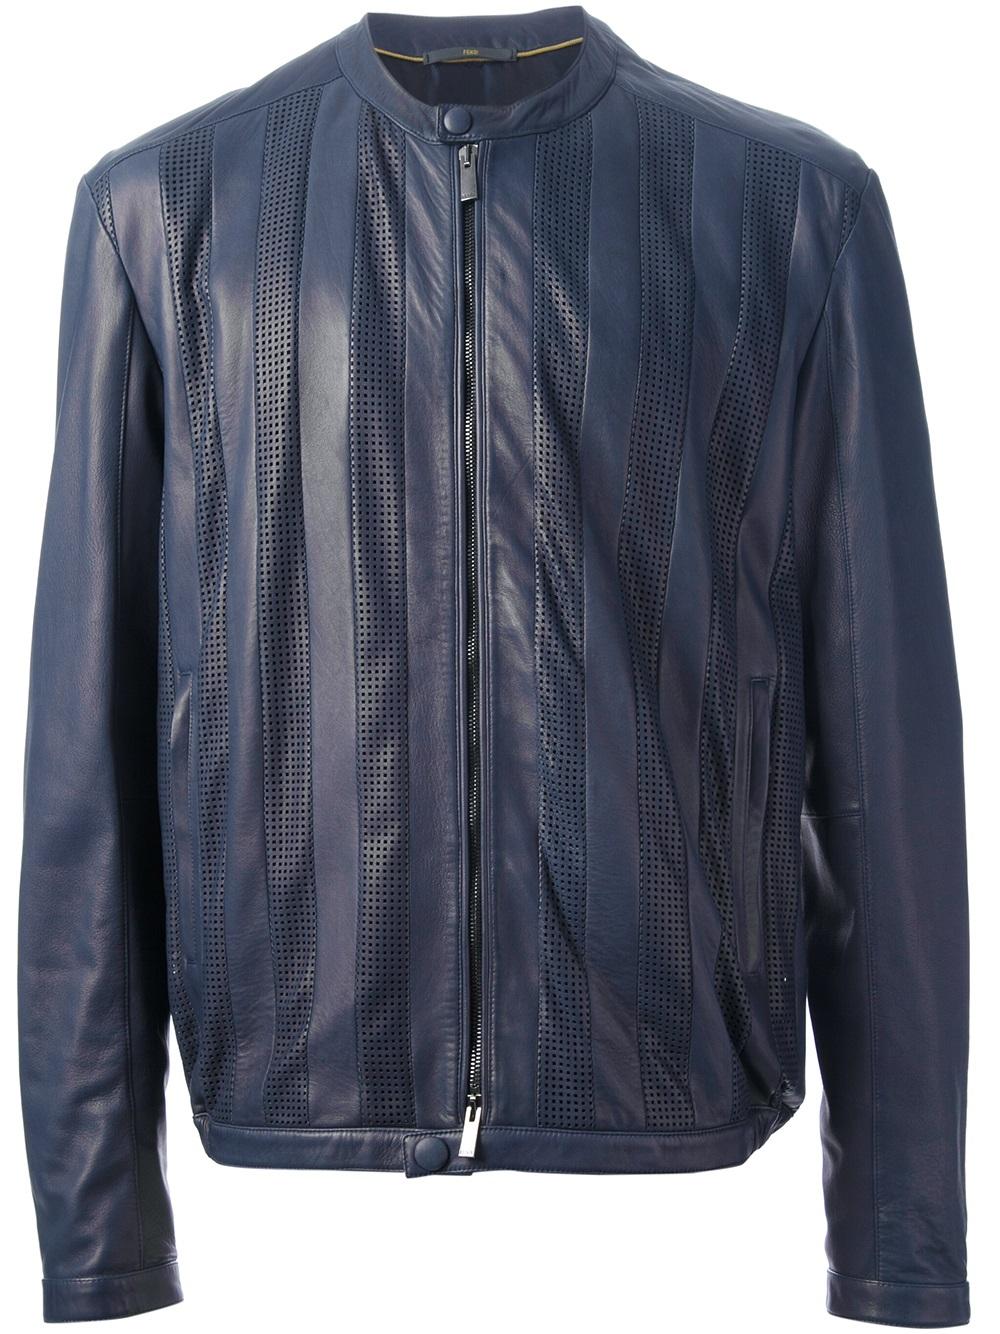 868ff7c307 Fendi Jacket Men s